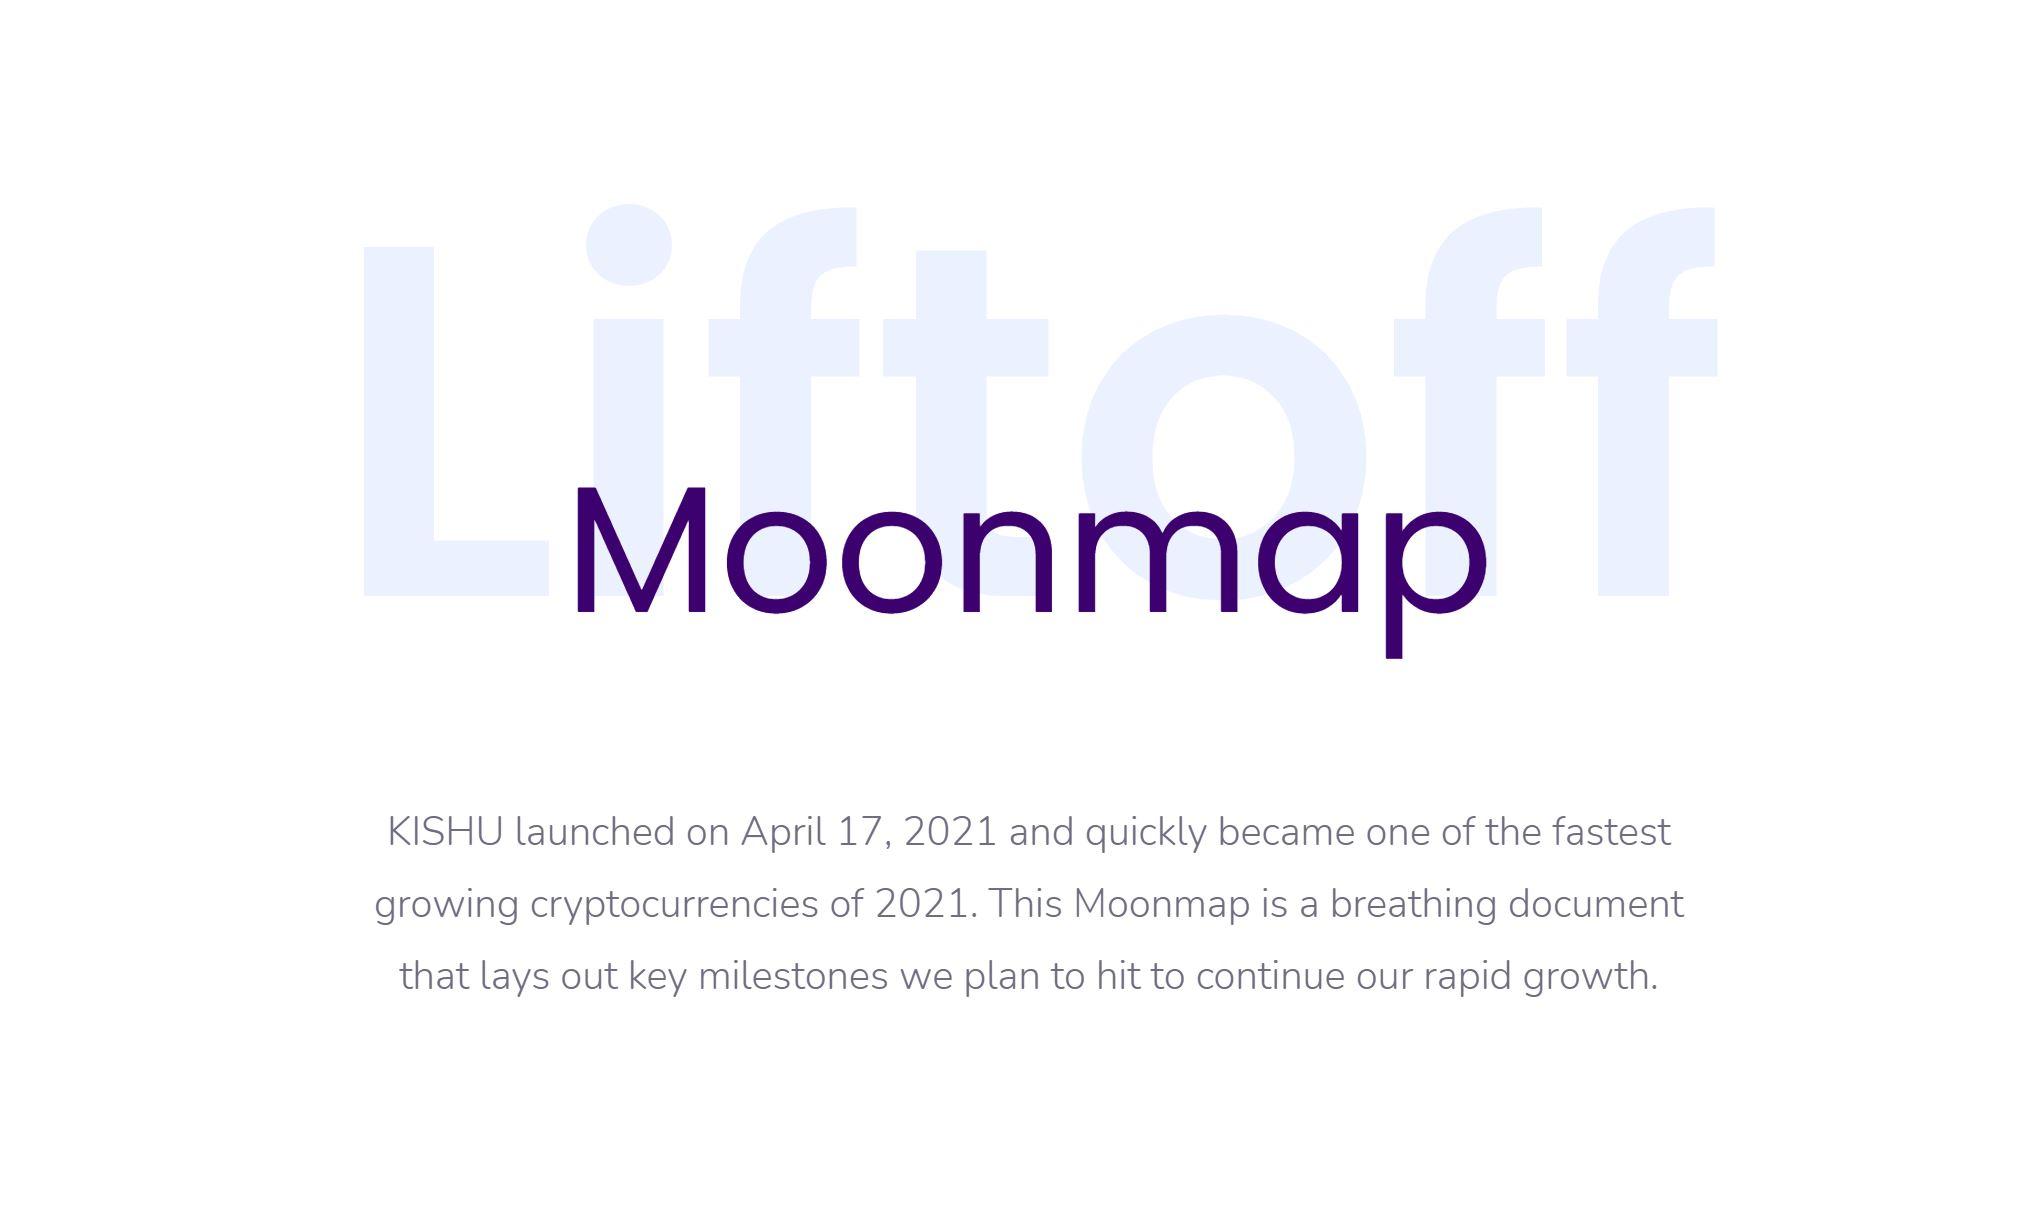 Kishu Inu Moonmap